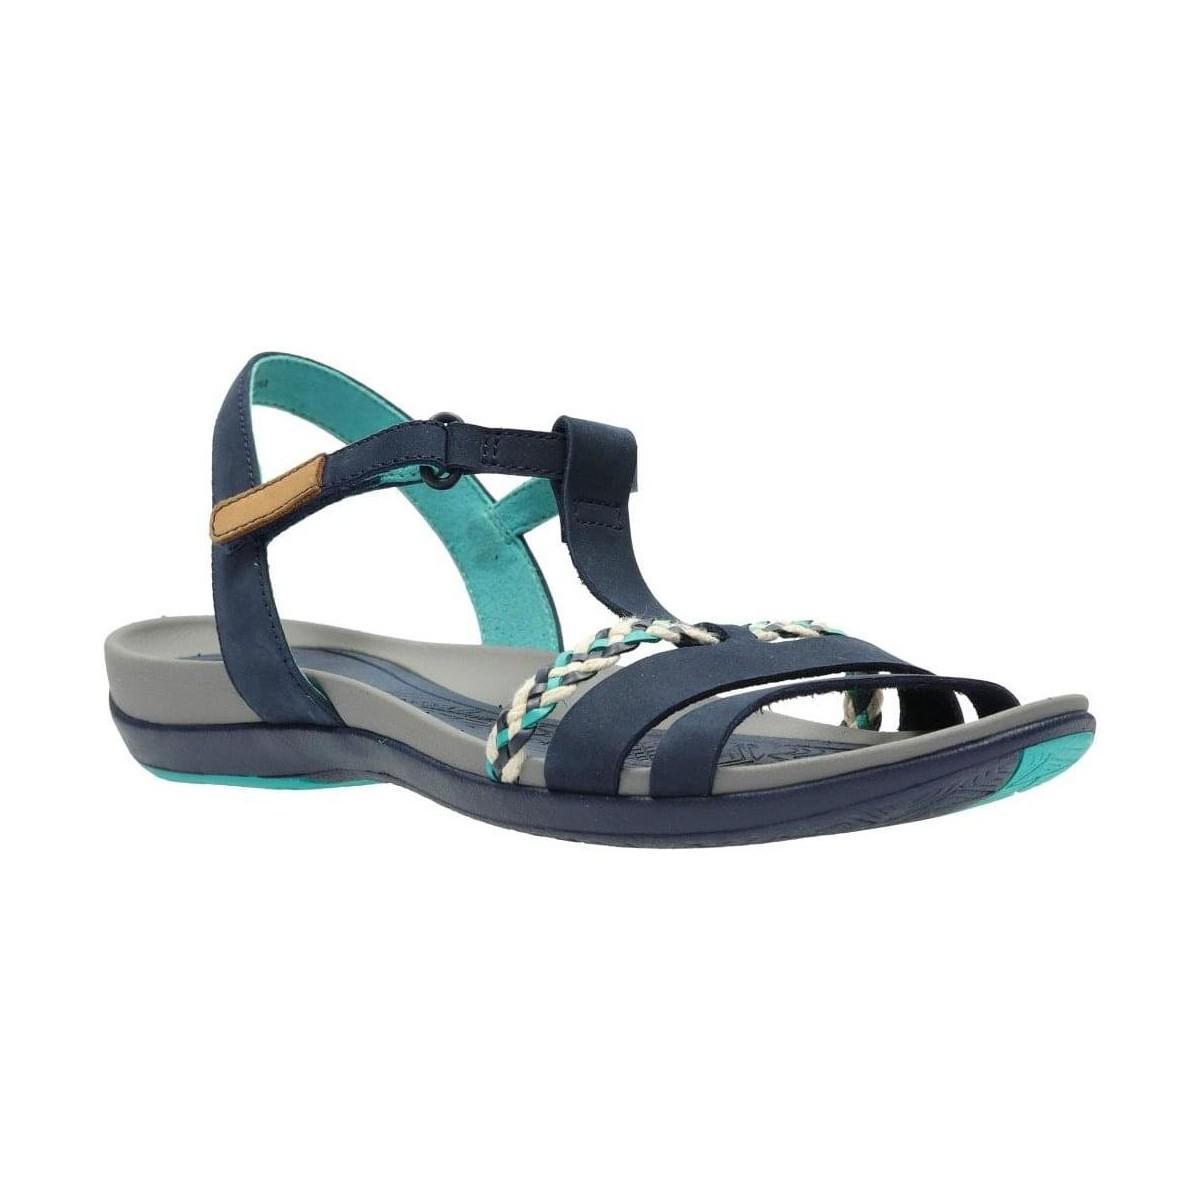 a2ed5a8d7a4d Clarks Tealite Grace Womens T-bar Sandals Women s Sandals In Blue in ...